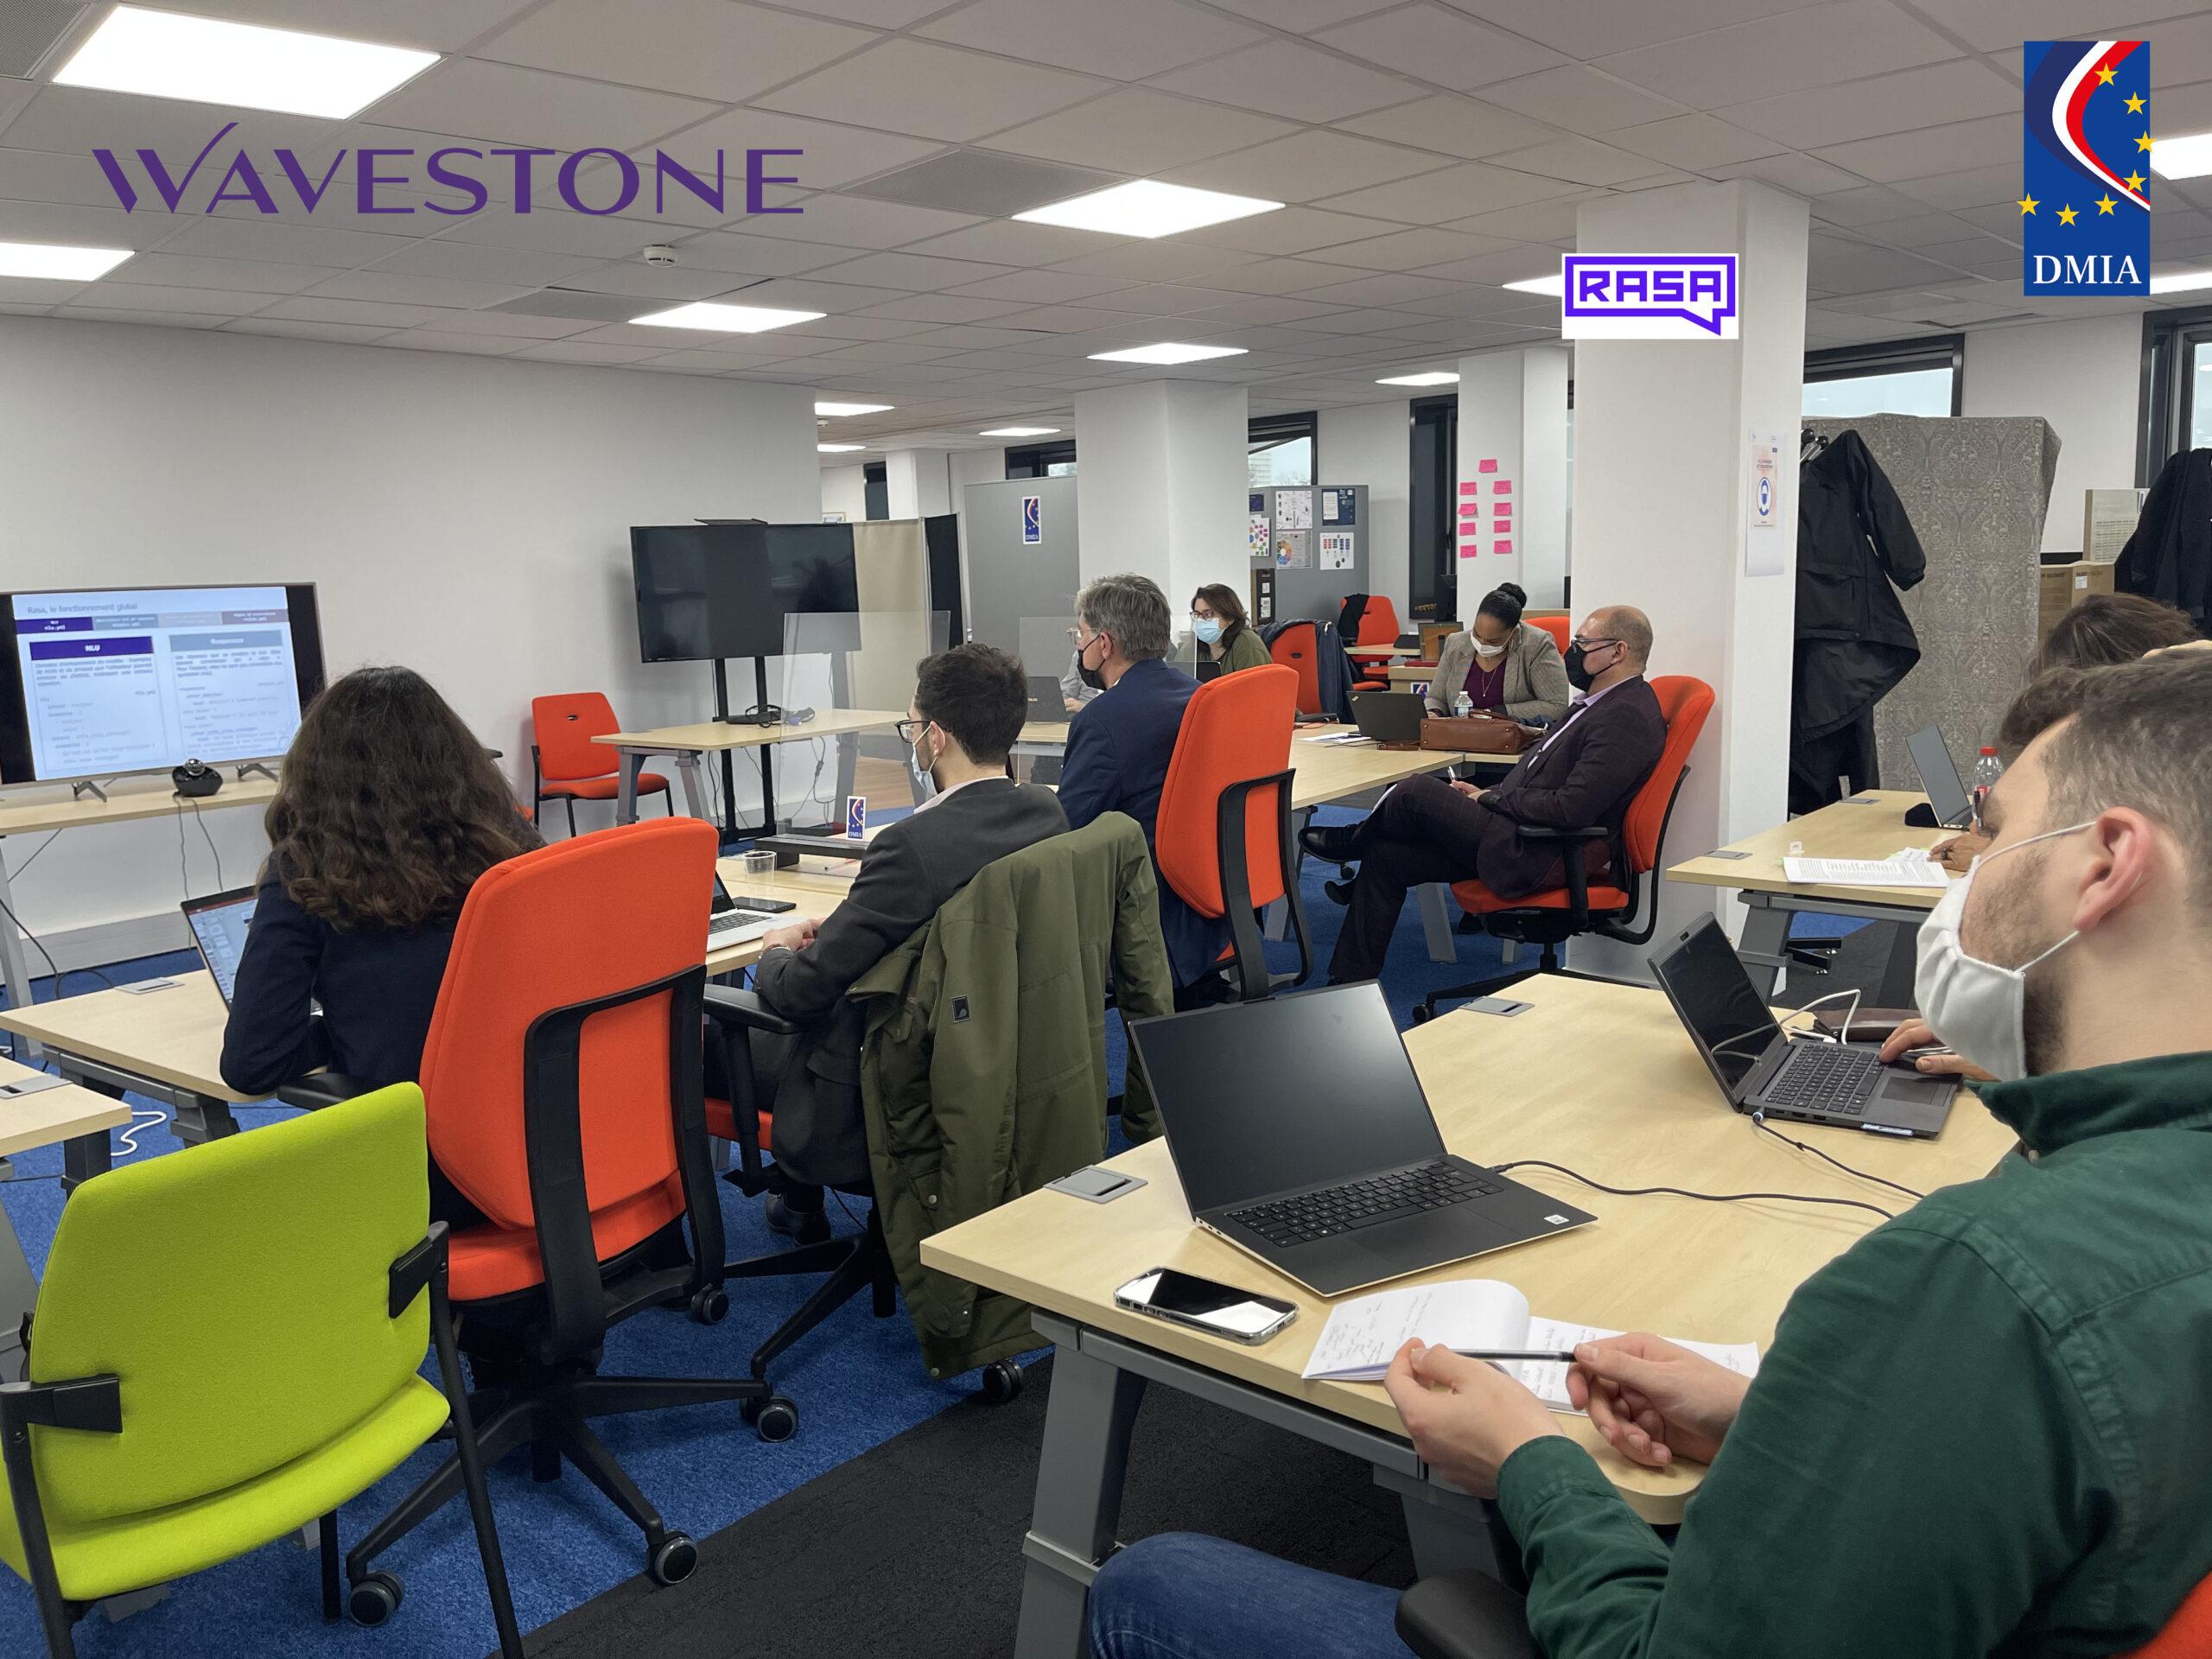 Formation mutualisée au TAL avec Wavestone